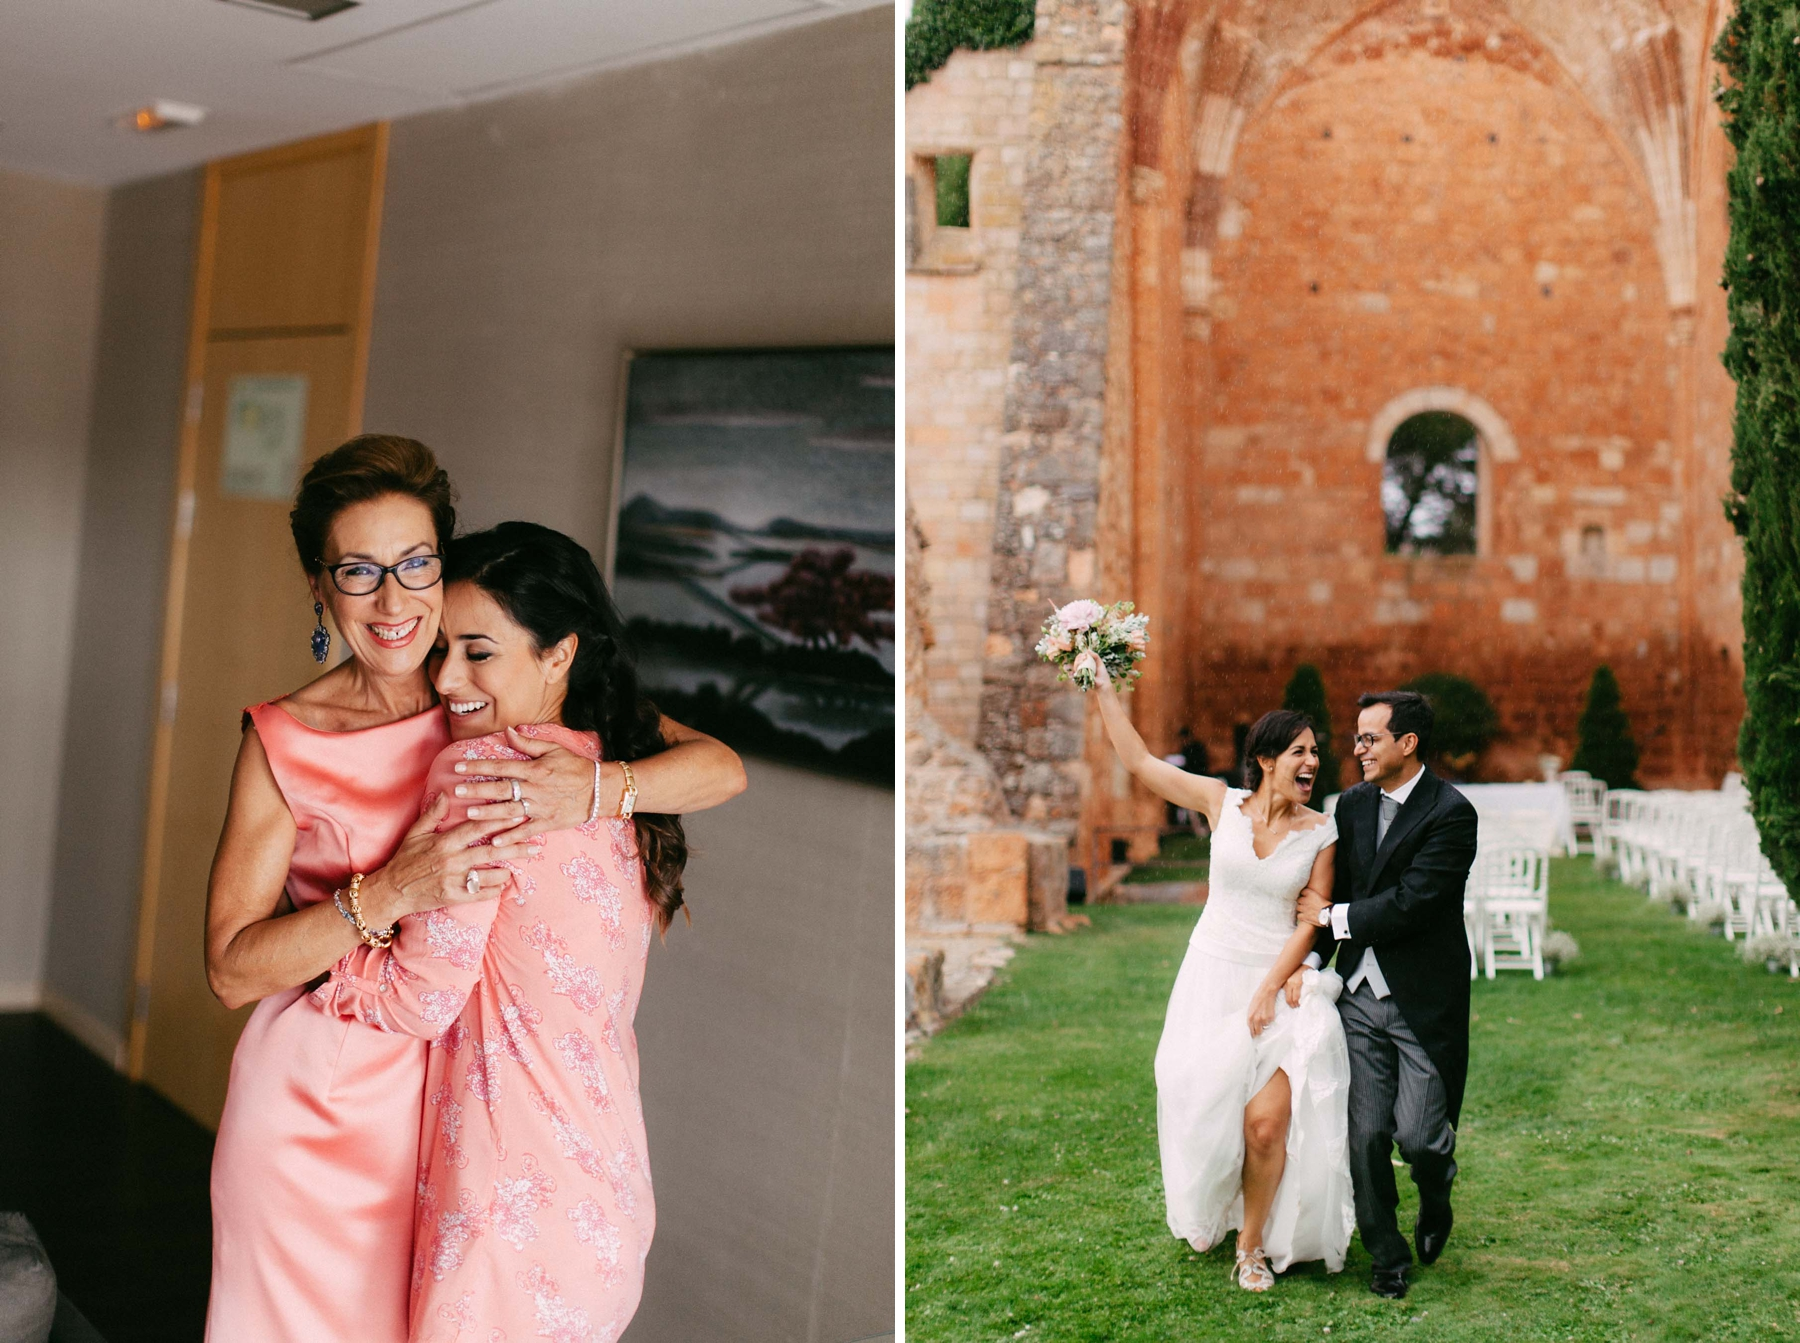 fotografo de bodas Jairo Crena-1-3